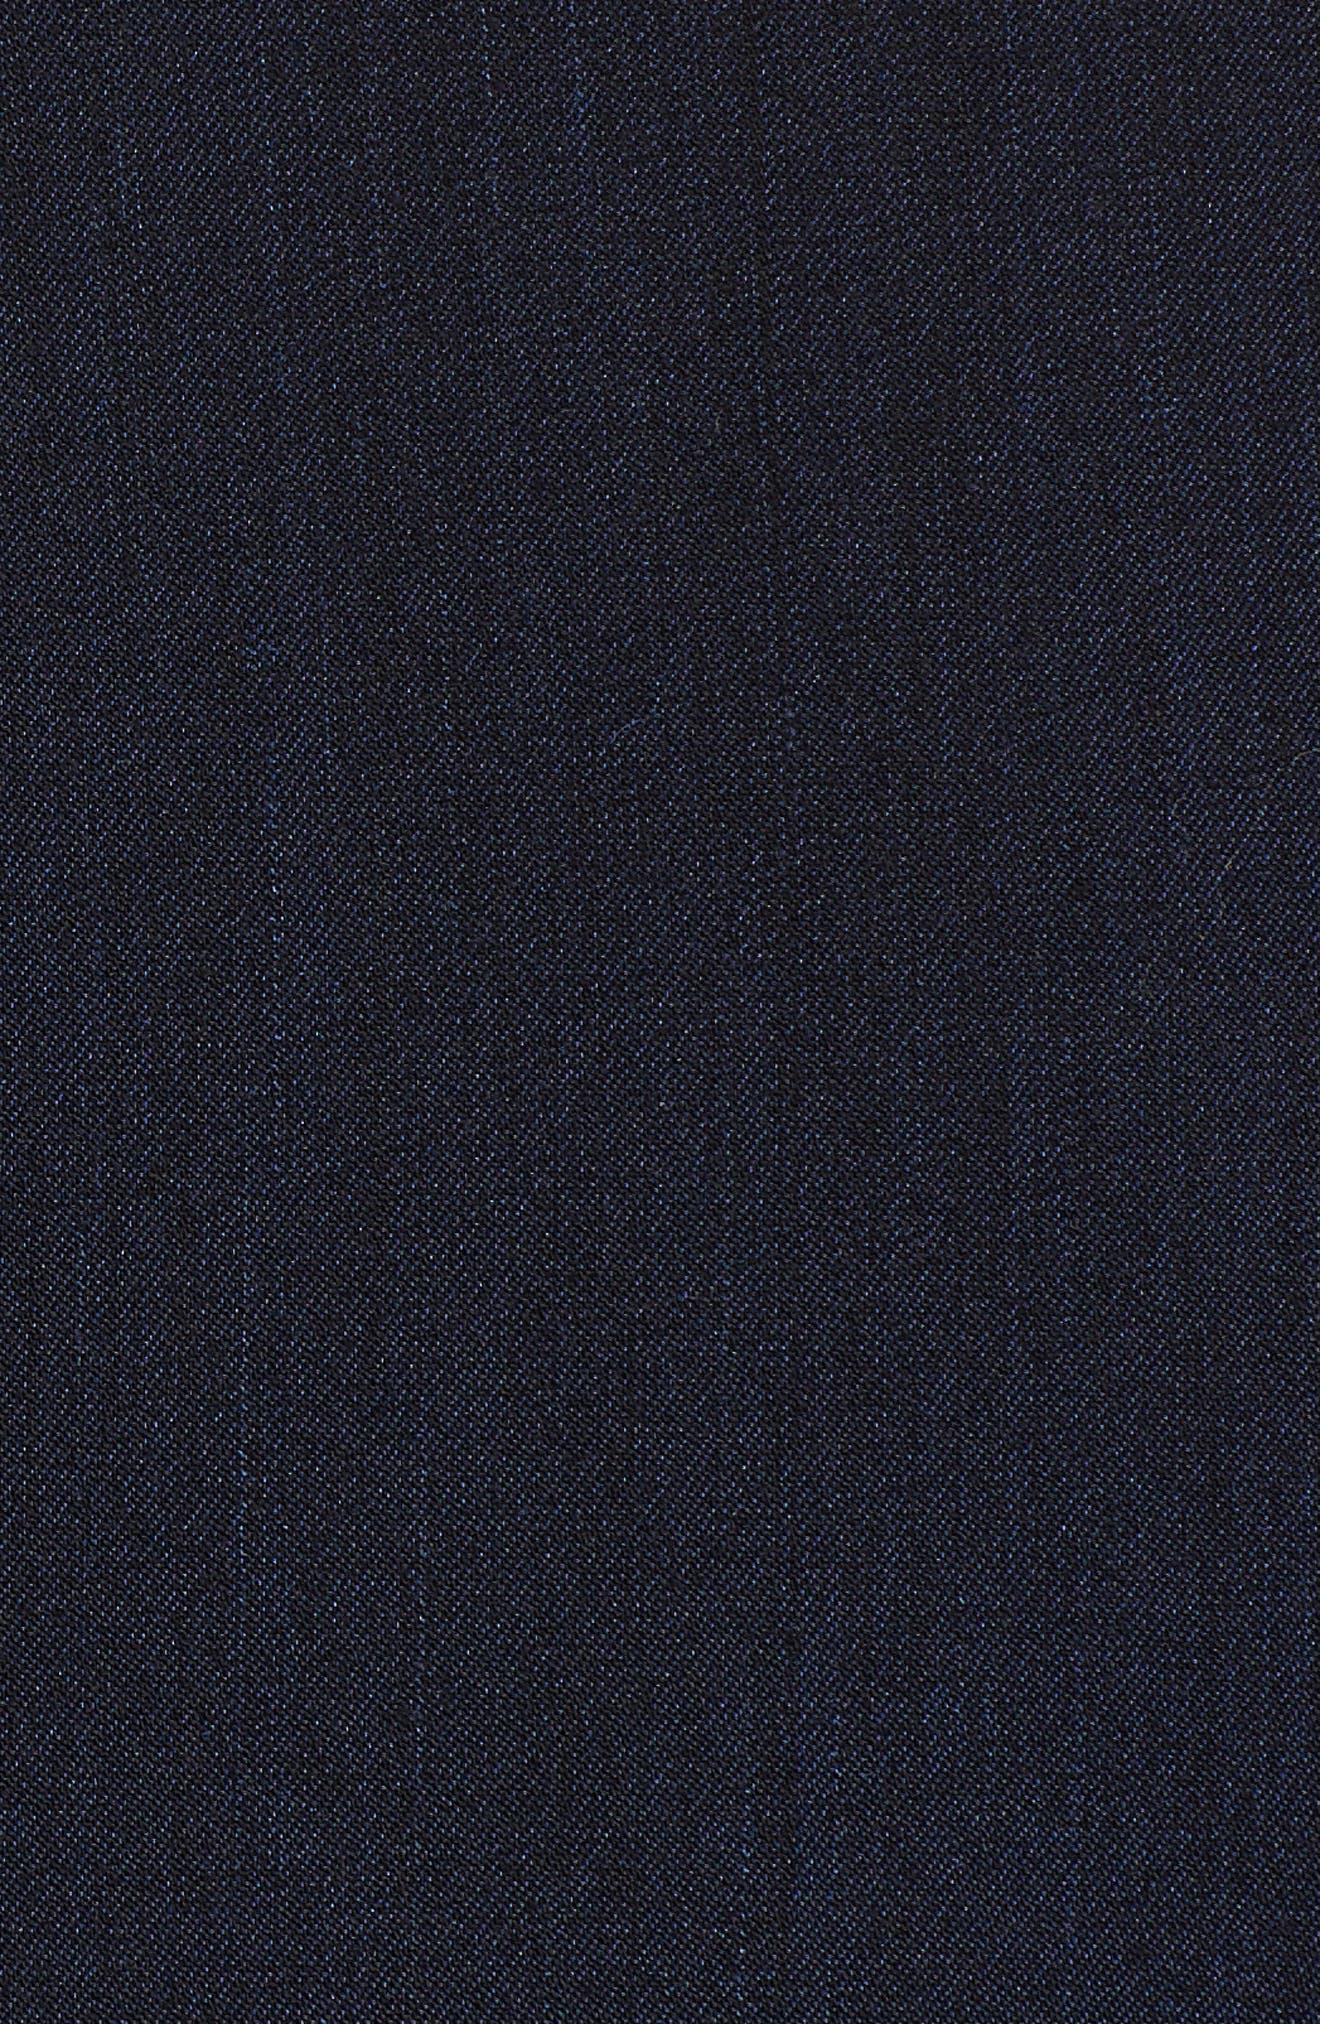 Notch Collar Stretch Denim Dress,                             Alternate thumbnail 10, color,